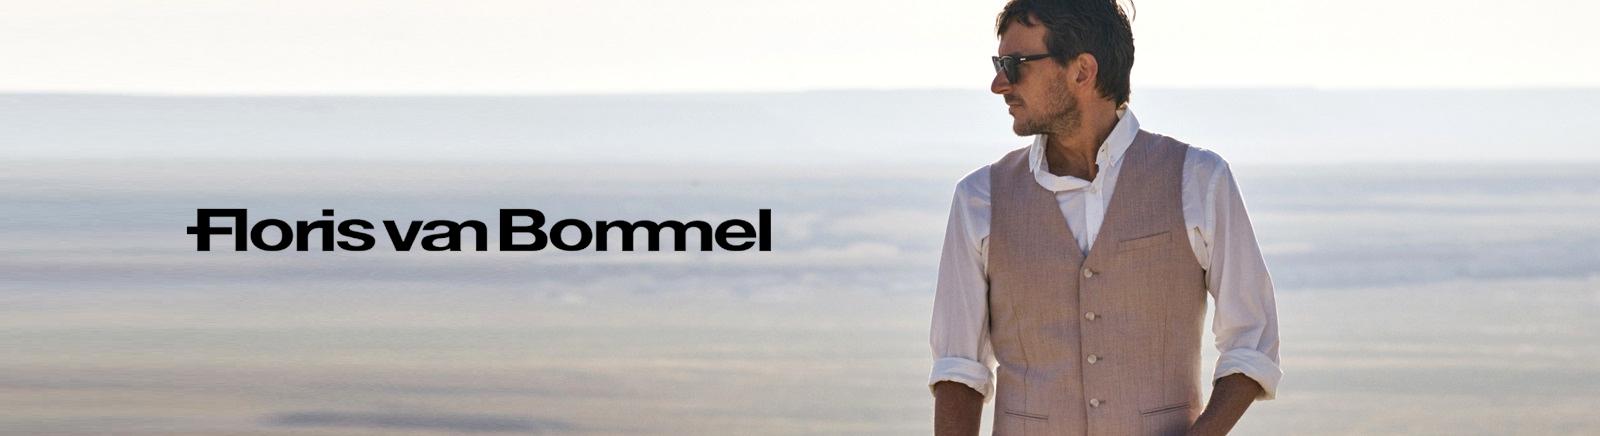 Floris van Bommel Markenschuhe online bestellen im Prange Schuhe Shop